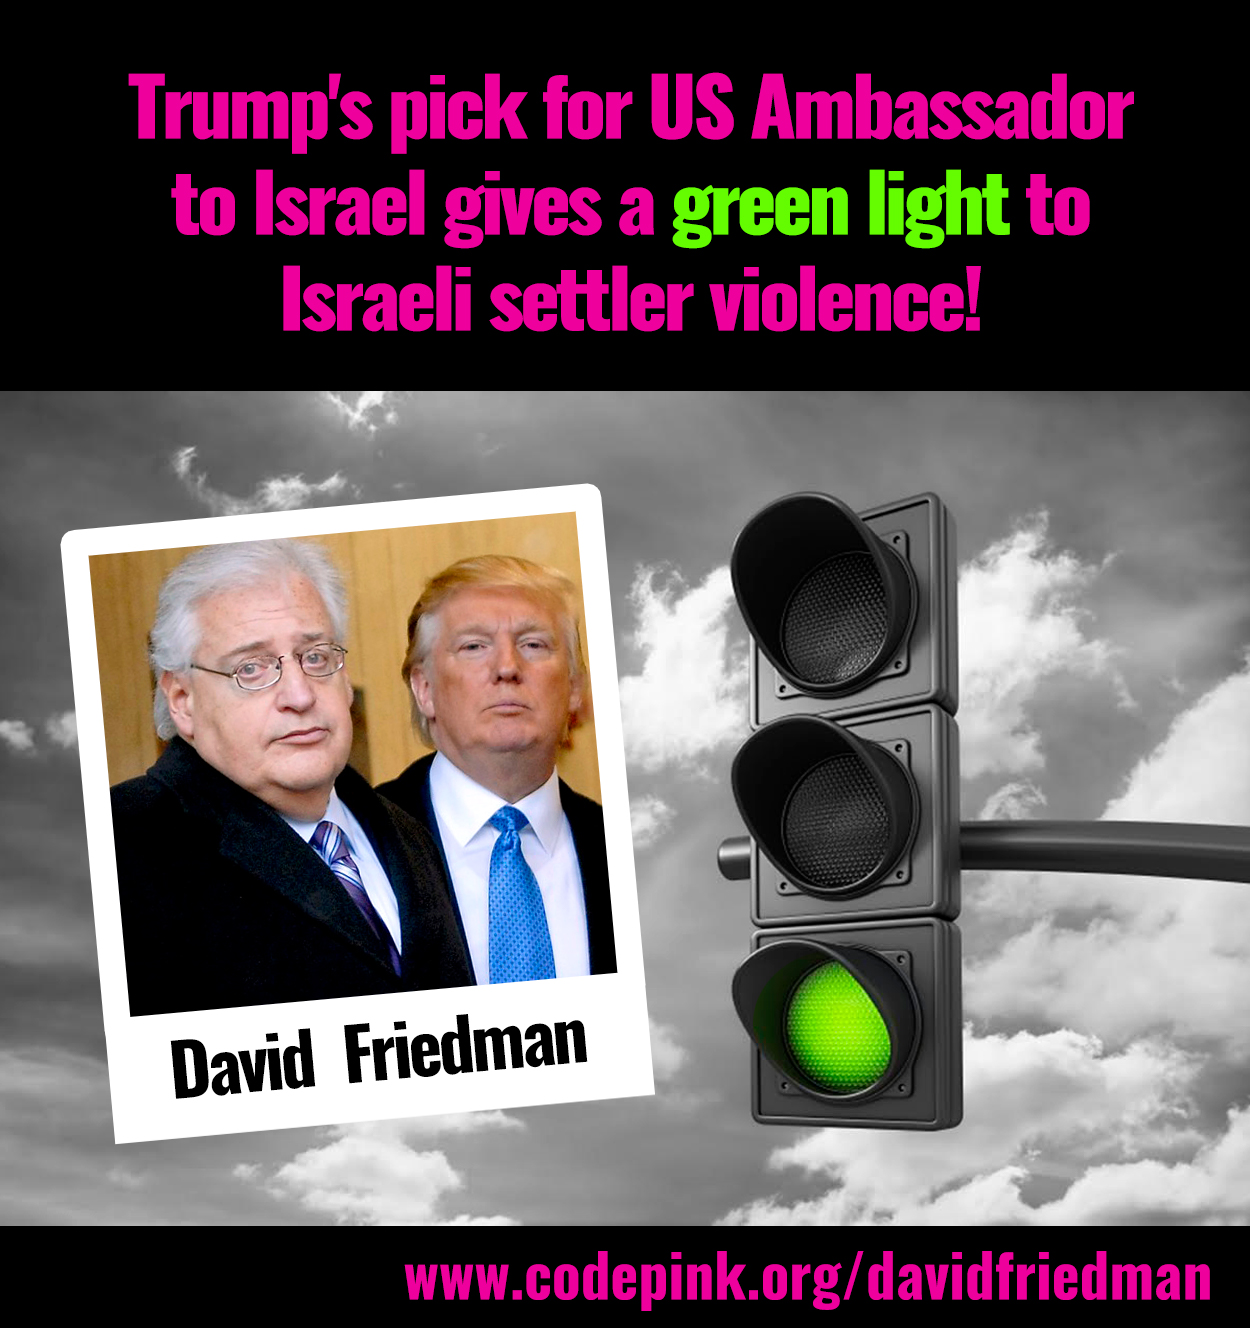 TrumpFriedman_2.jpg